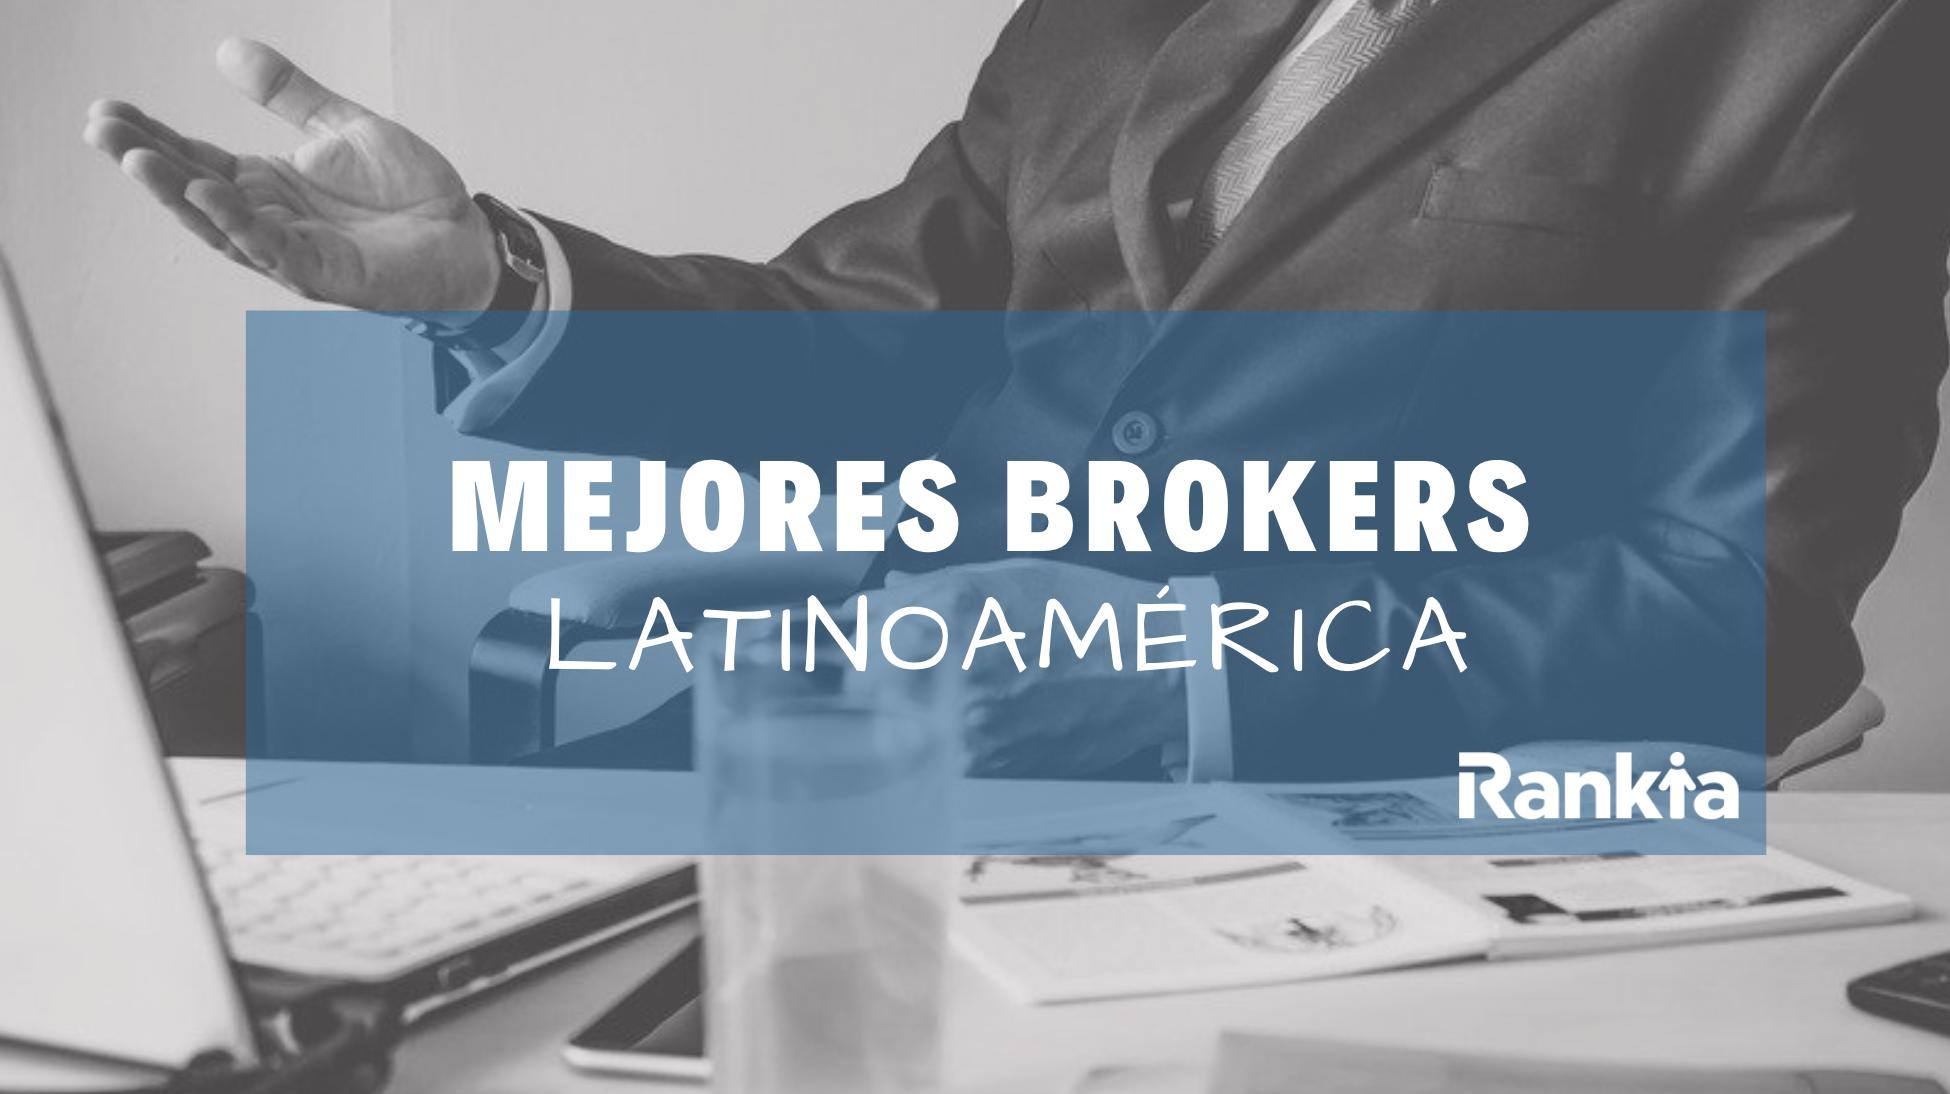 Mejores brokers para latinoamérica